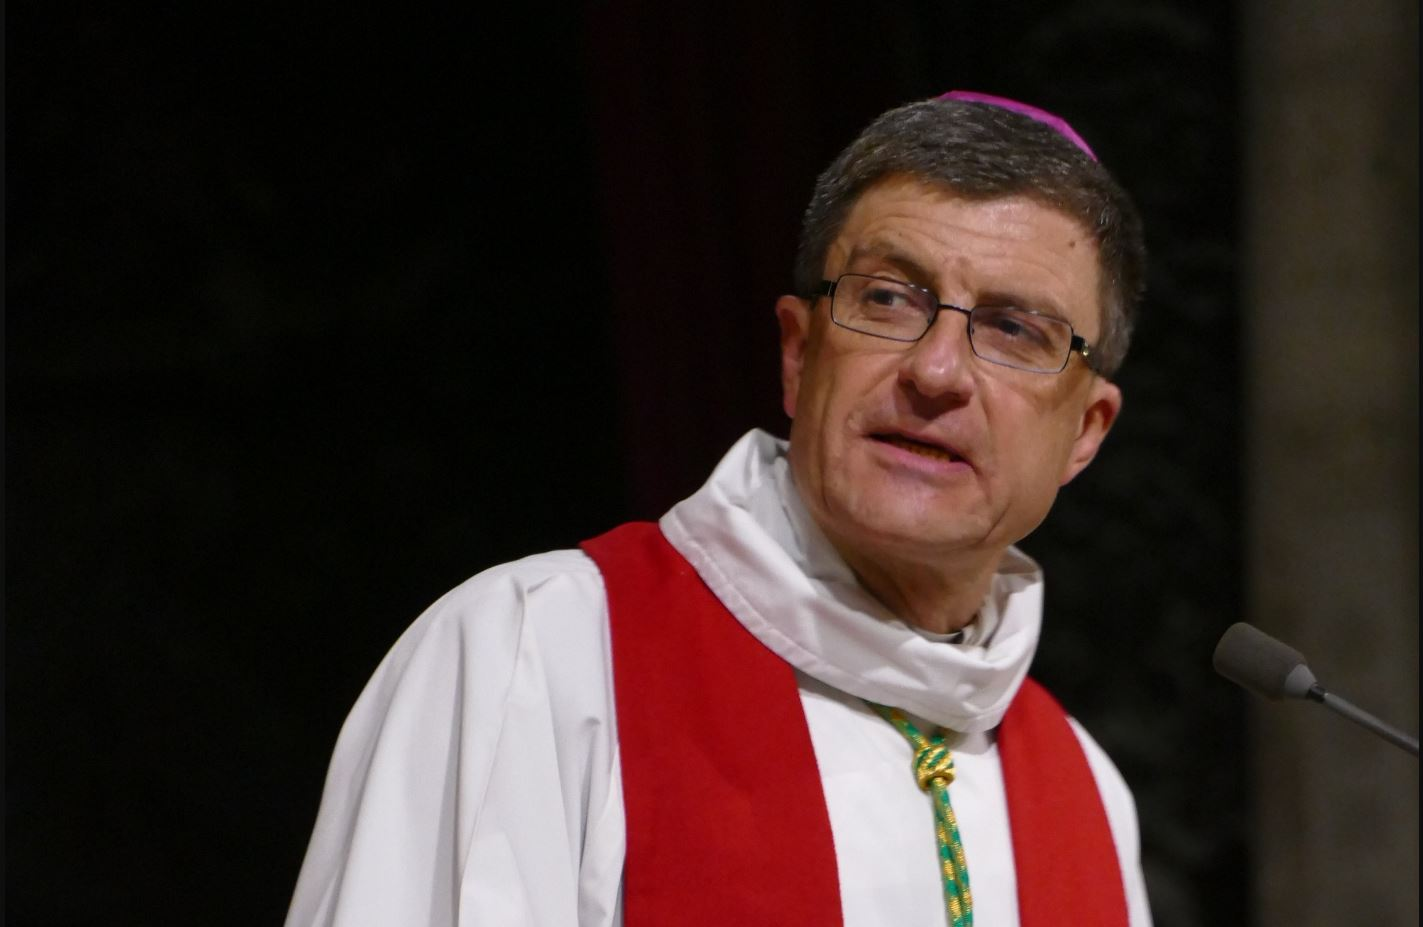 Mgr Eric de Moulins Beaufort © Wikimedia commons / Peter Potrowl